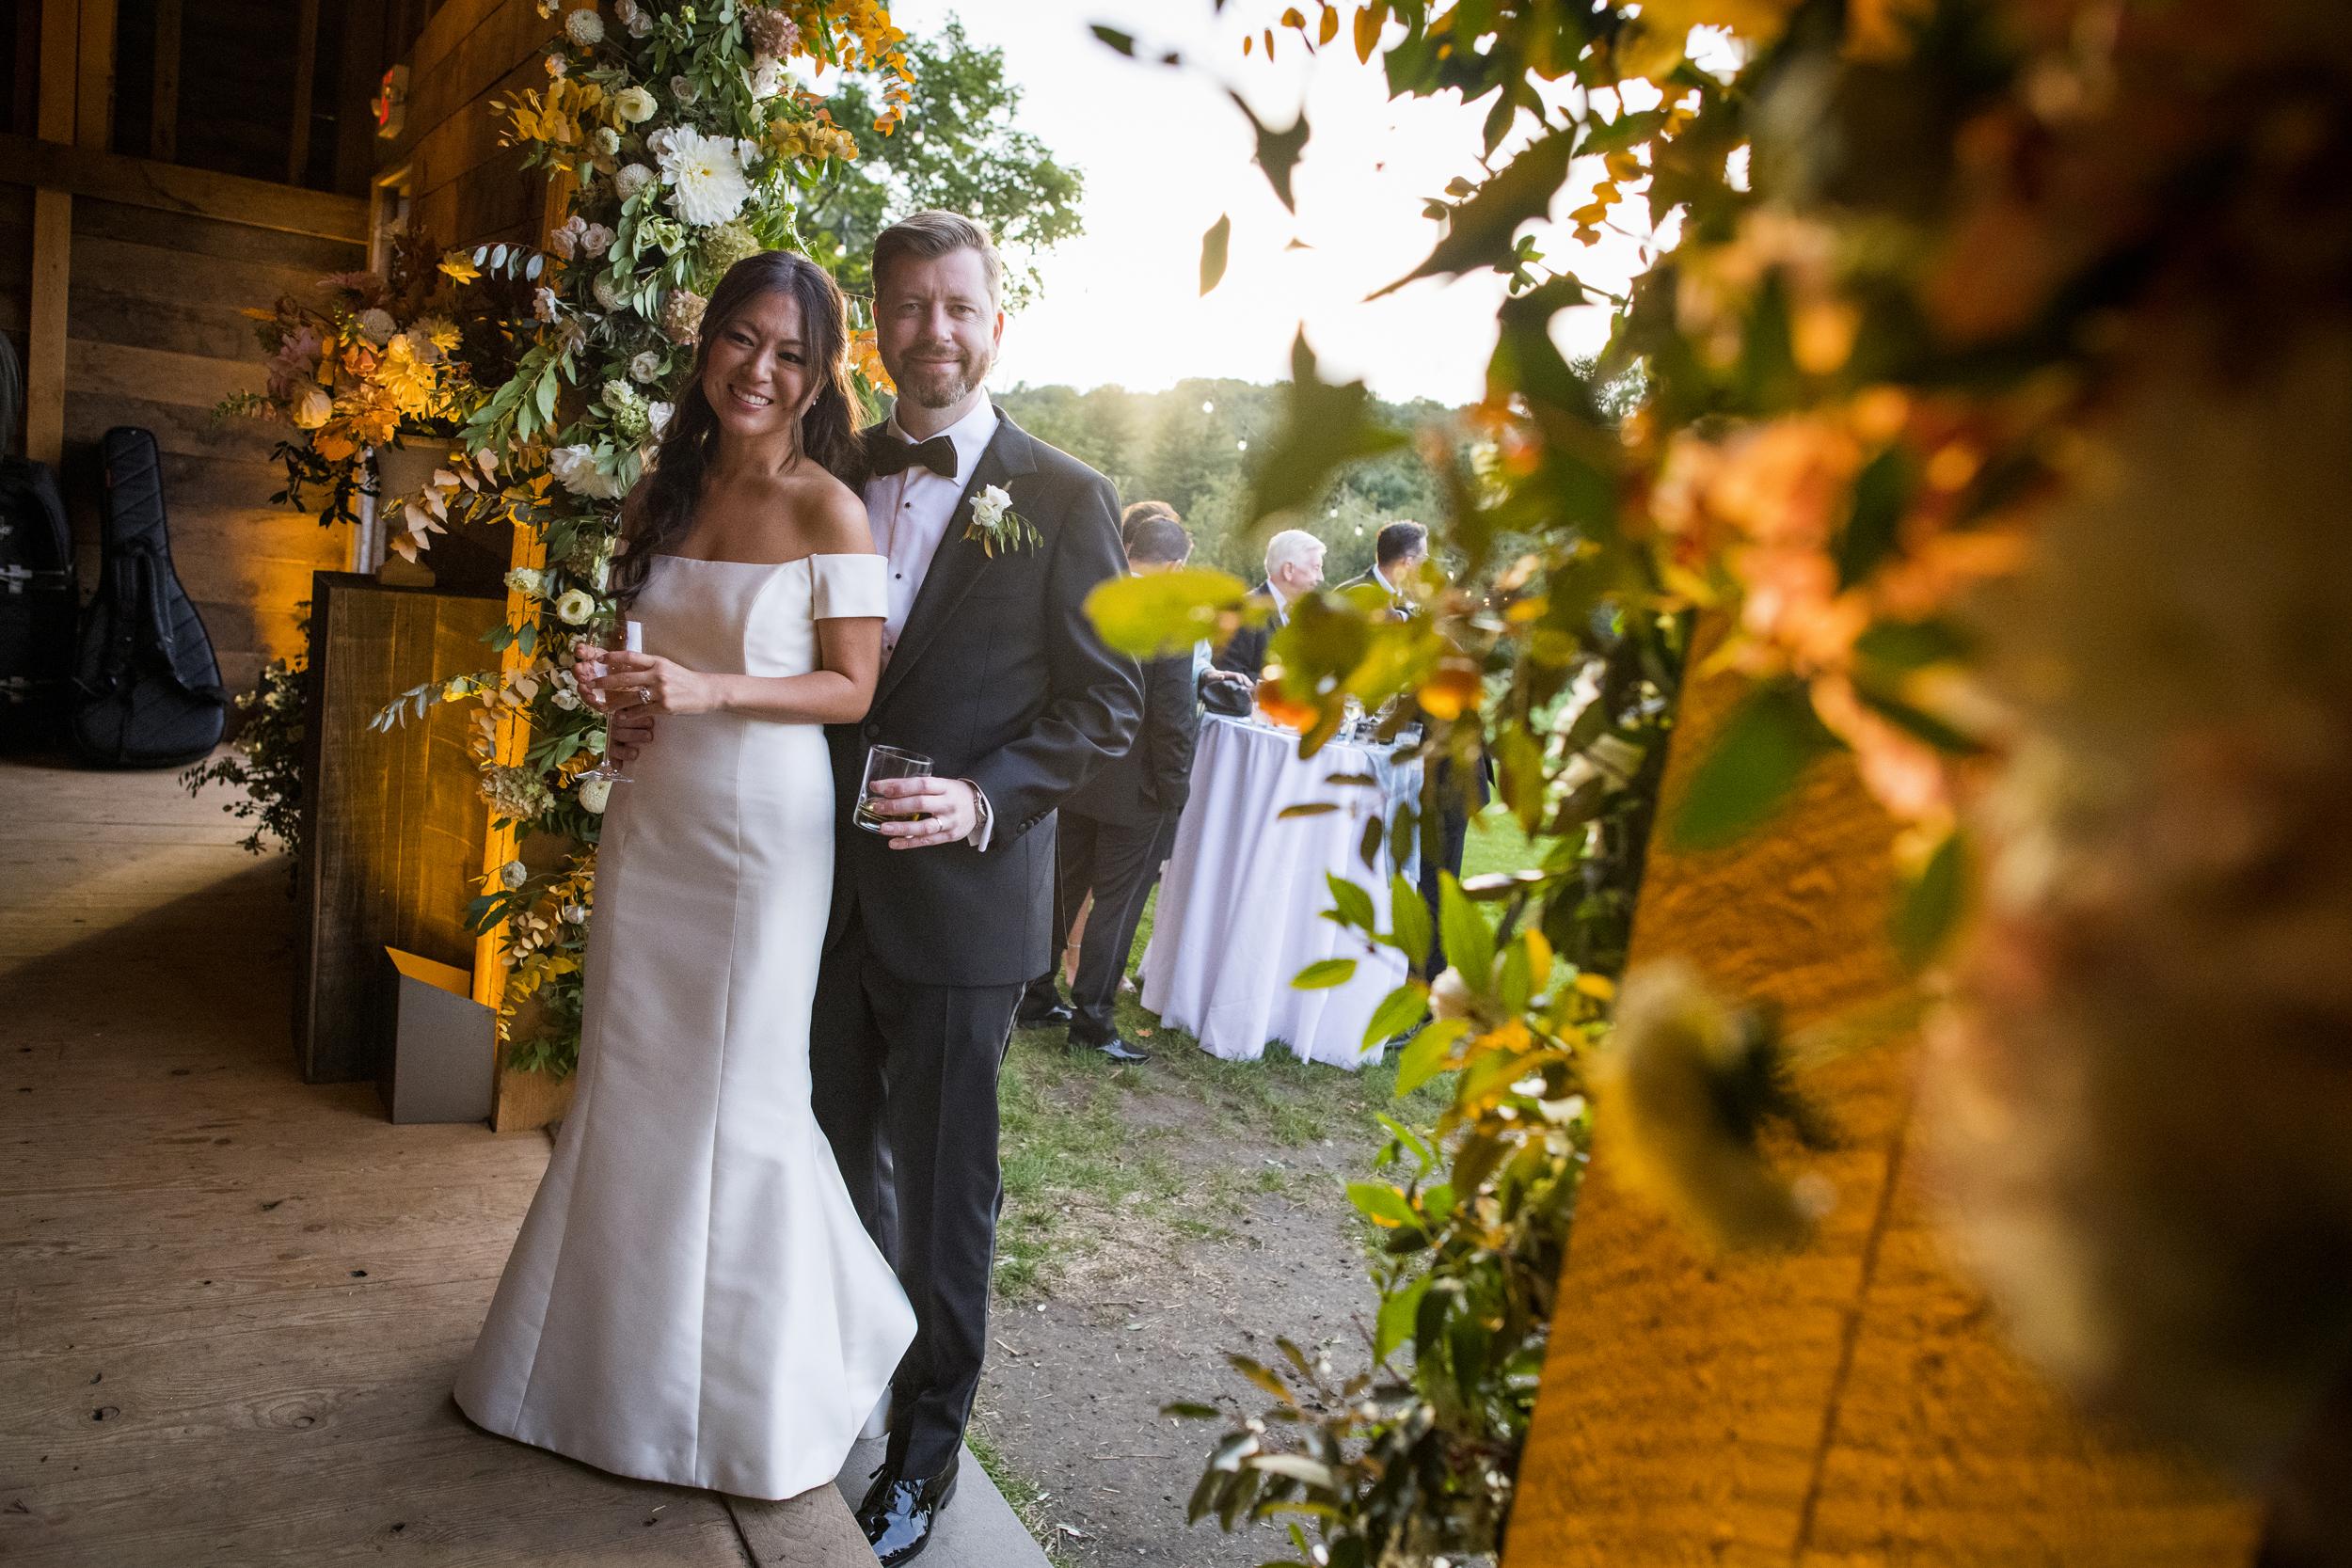 20180922_Brightsmith_CarolNick_Wedding_10029.jpg